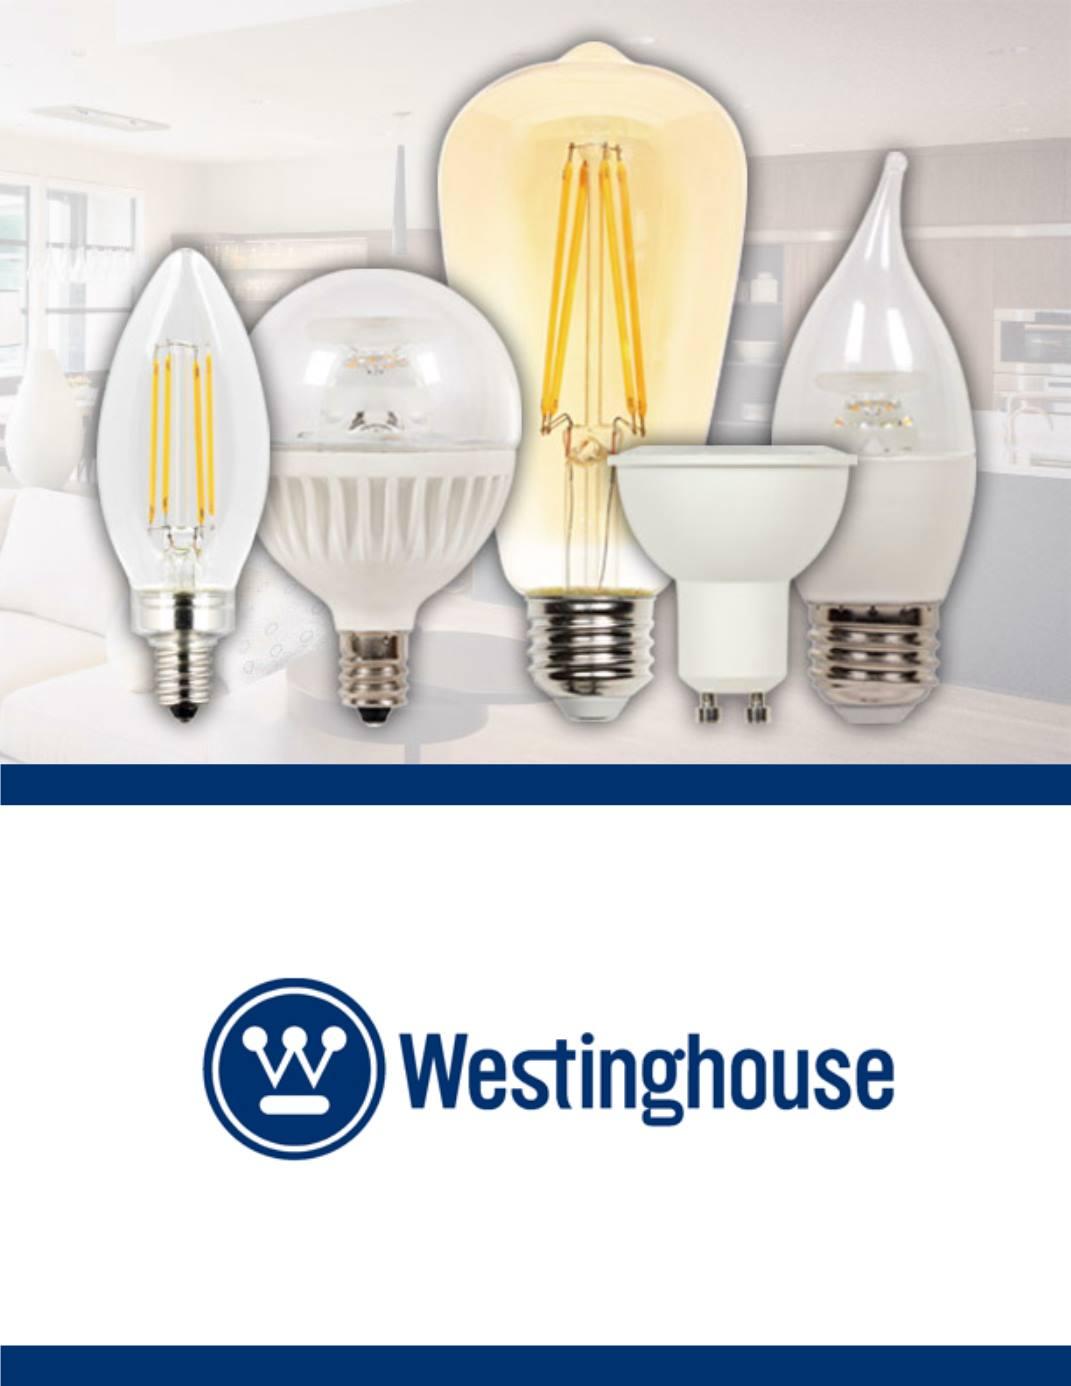 Westinghouse Lighting Corporation